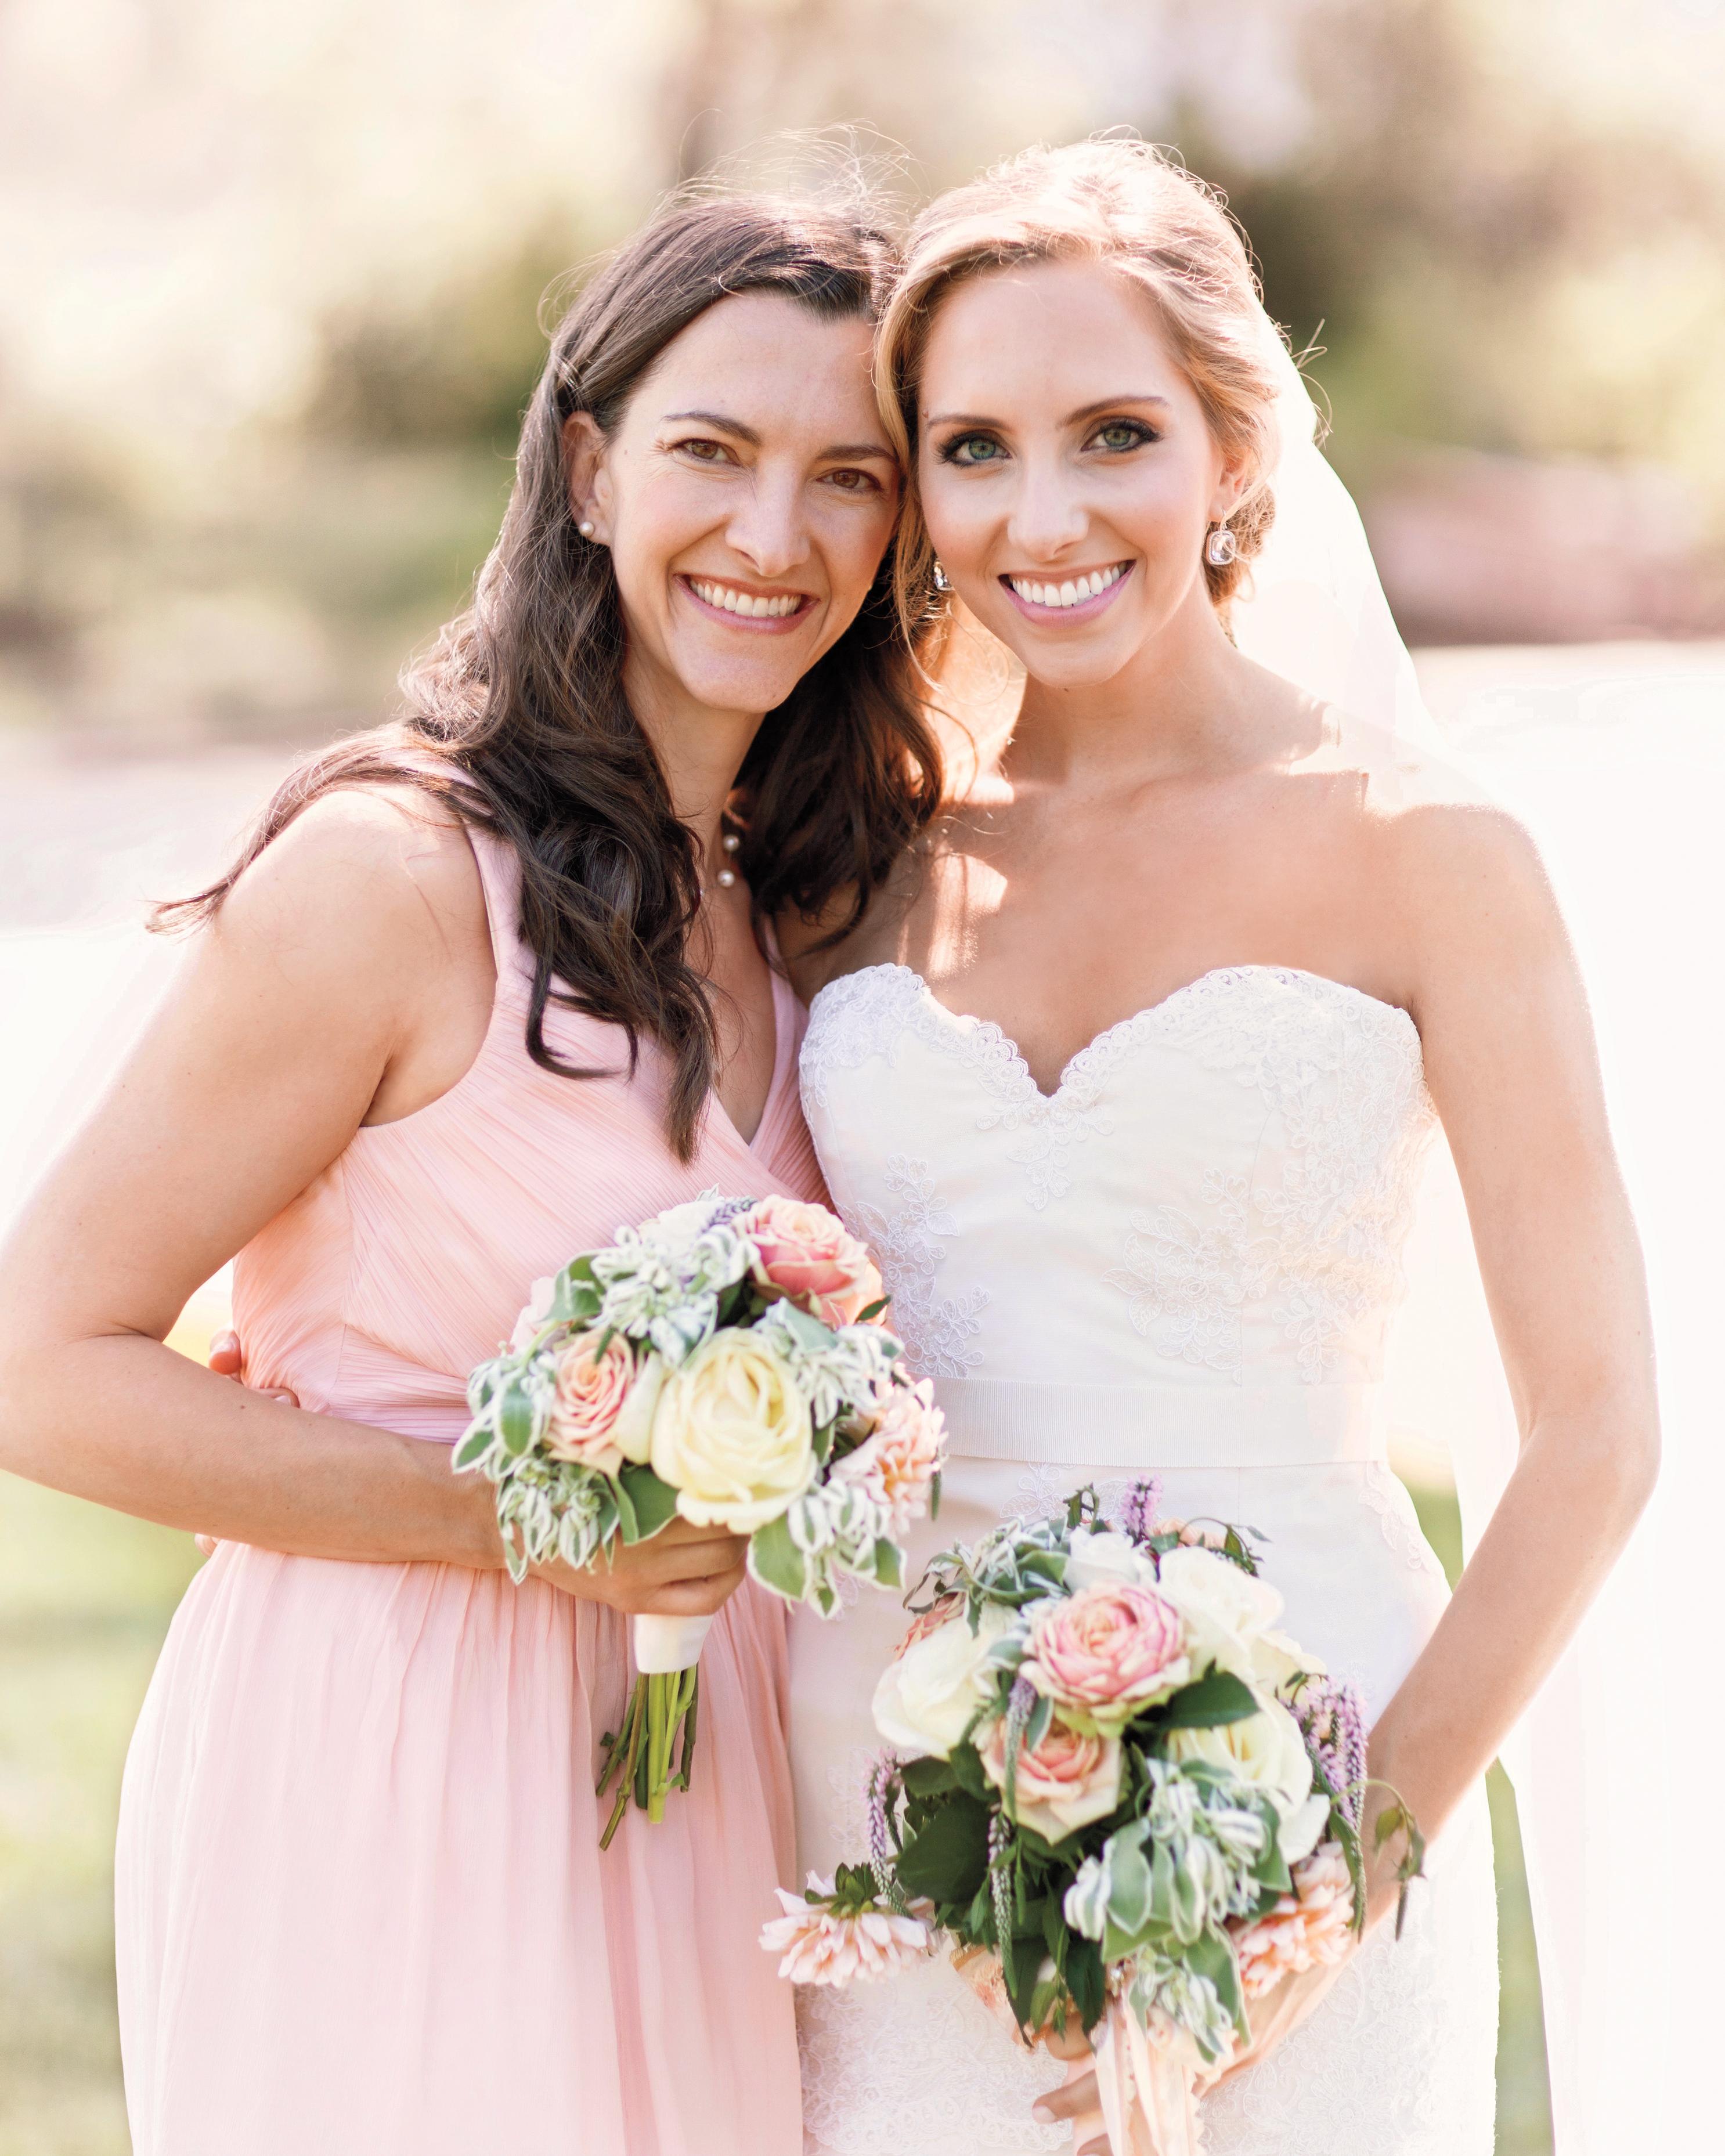 bride-bridesmaid-sarah-smith-glass-jar-photography-mwd110175.jpg